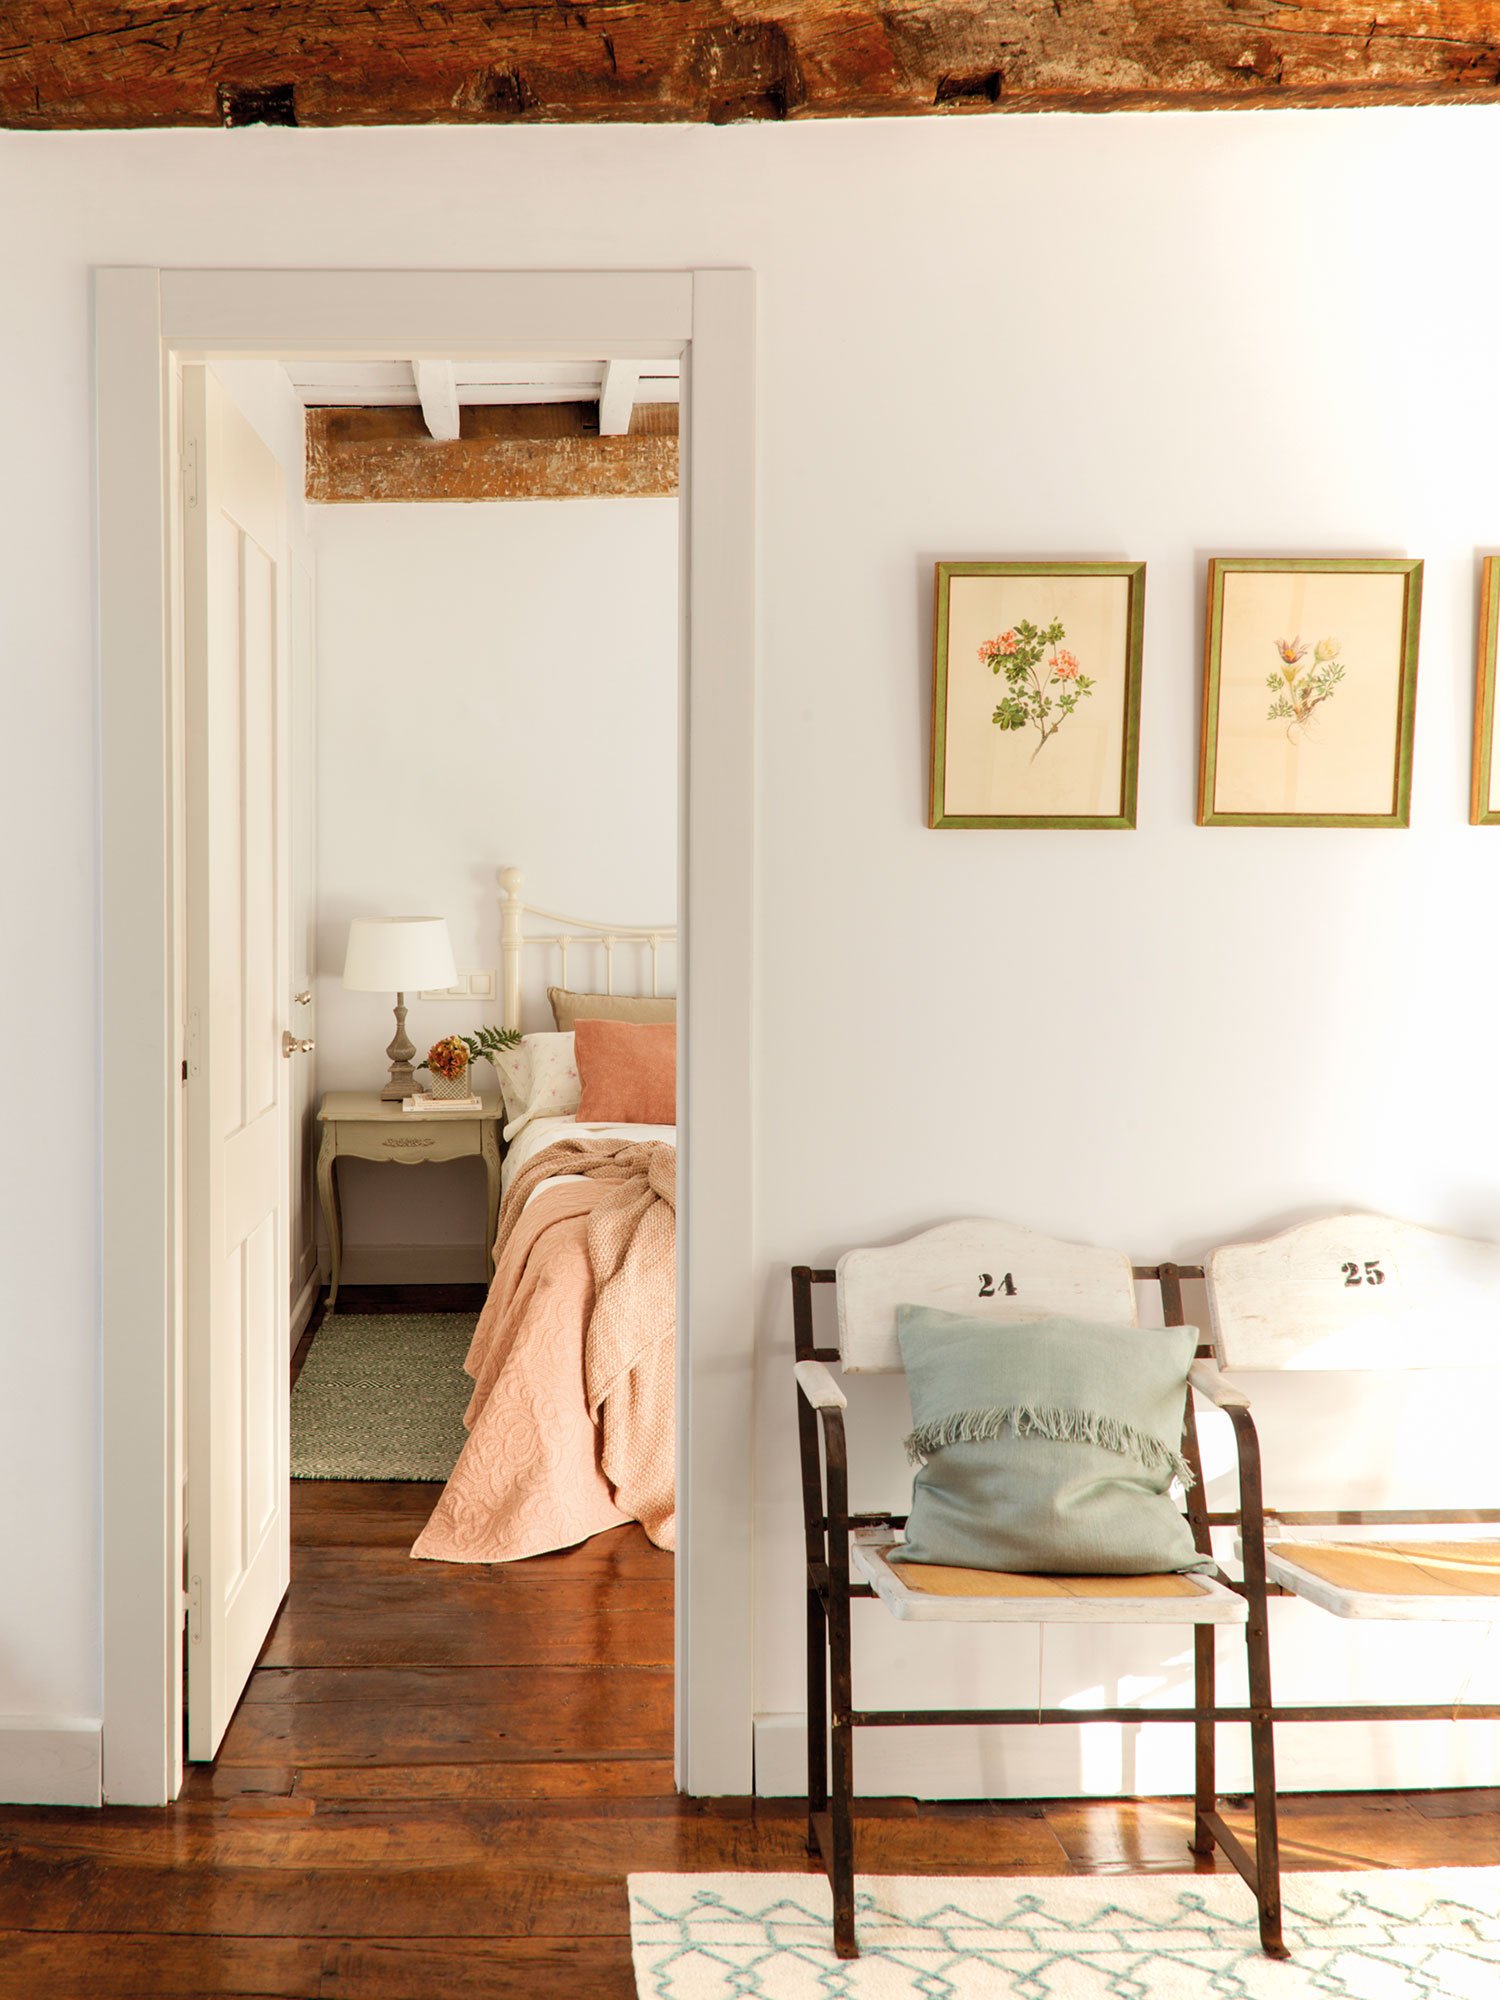 Decorar con flores 12 ideas para vestir tu casa de primavera for Cuadros modernos decoracion para tu dormitorio living